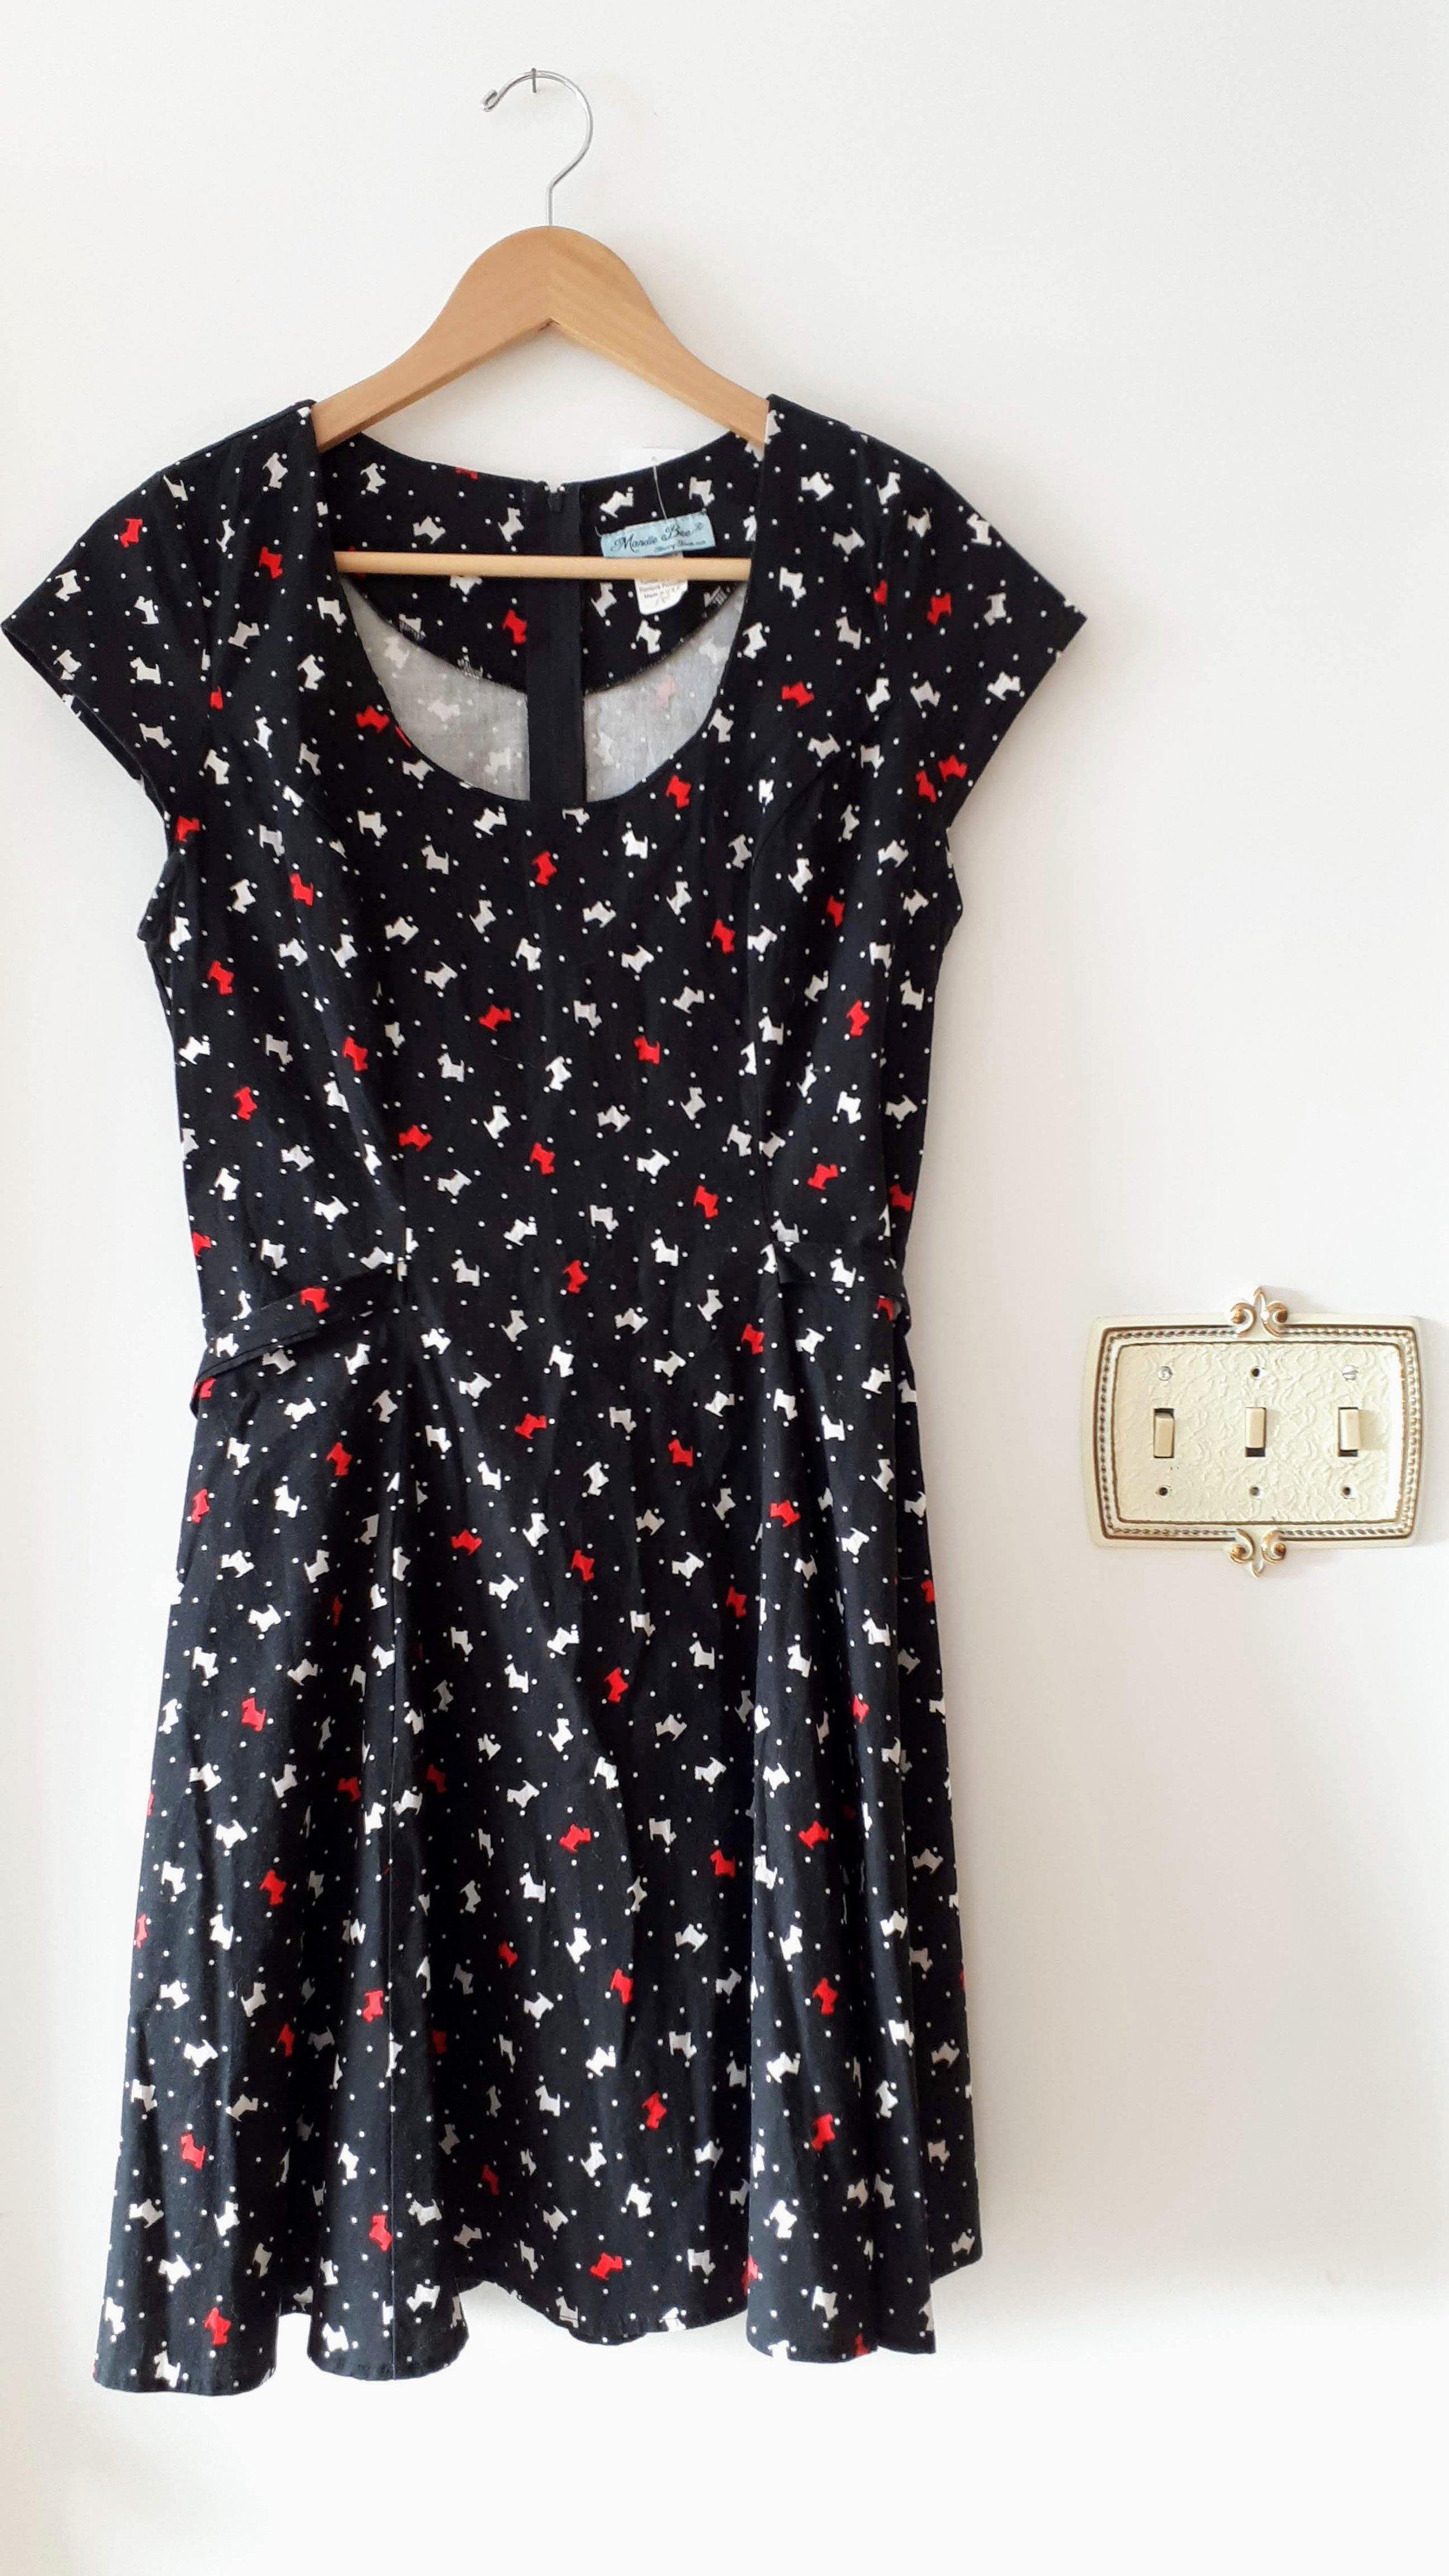 Mandie Bee dress; Size L, $42